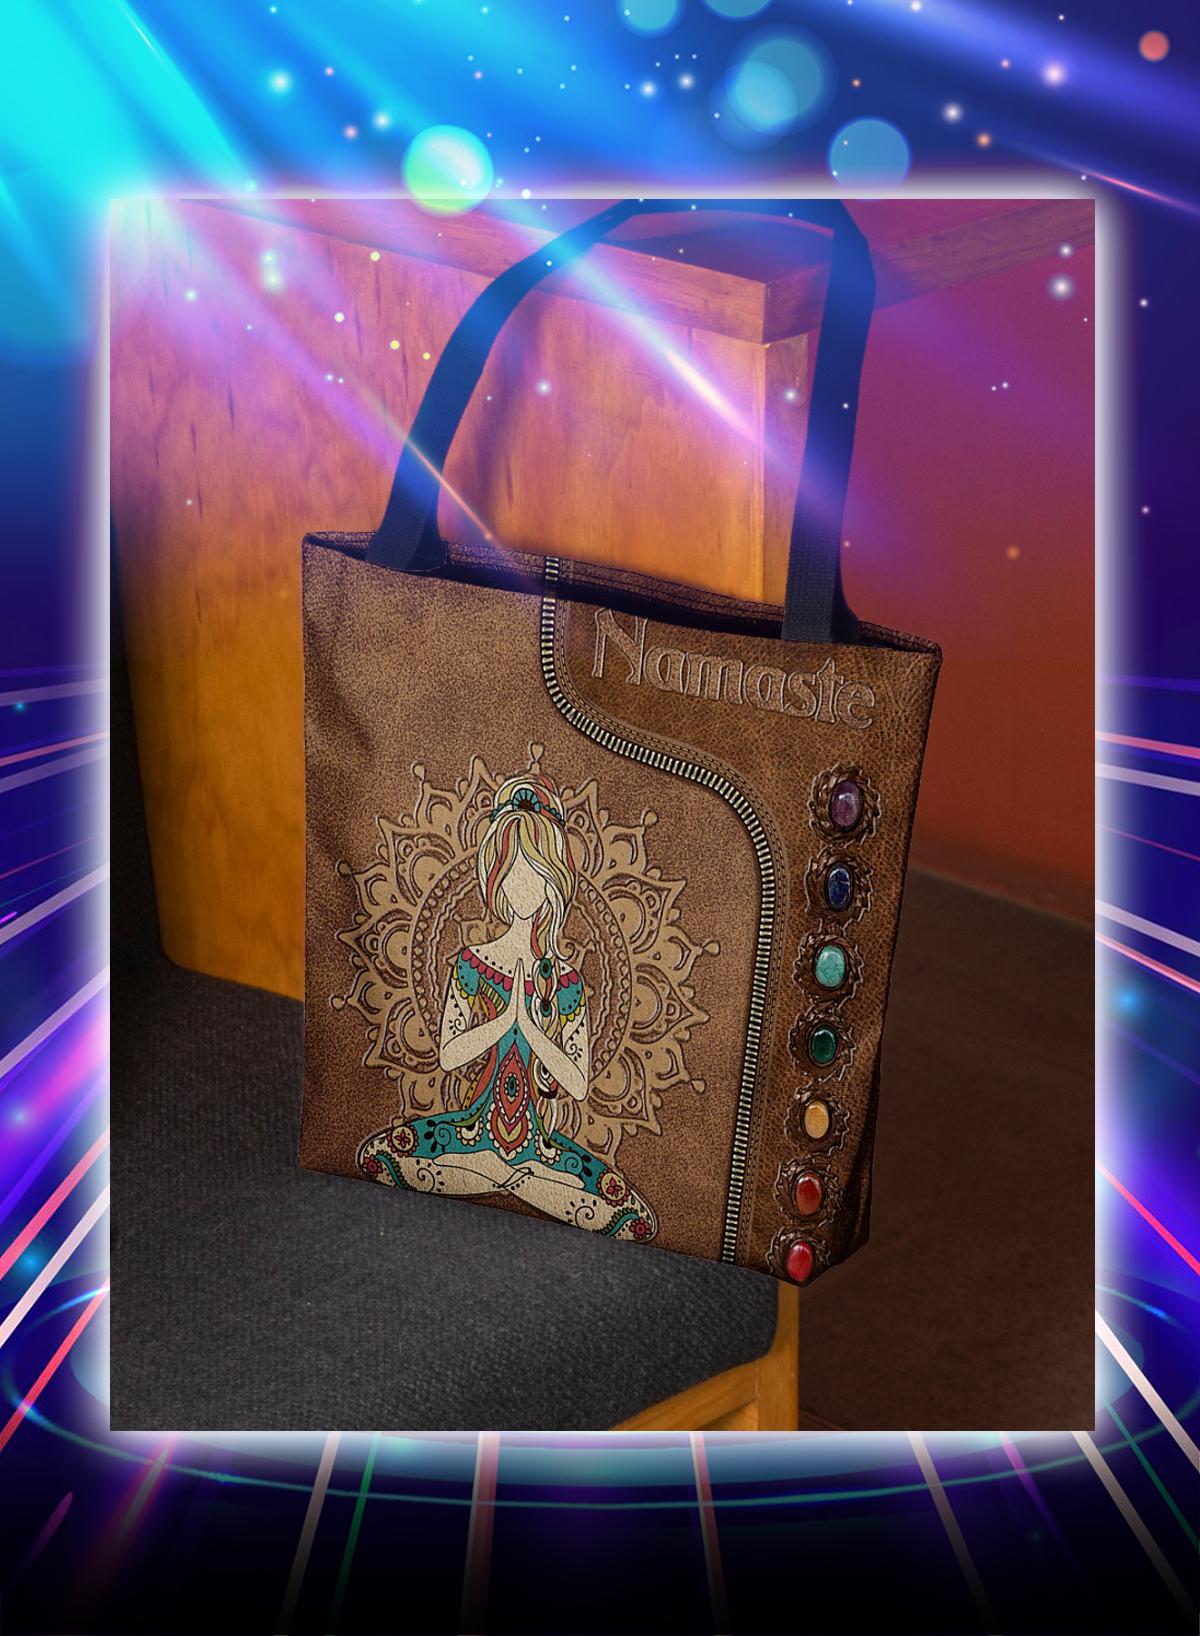 Yoga girl namaste tote bag - Picture 1